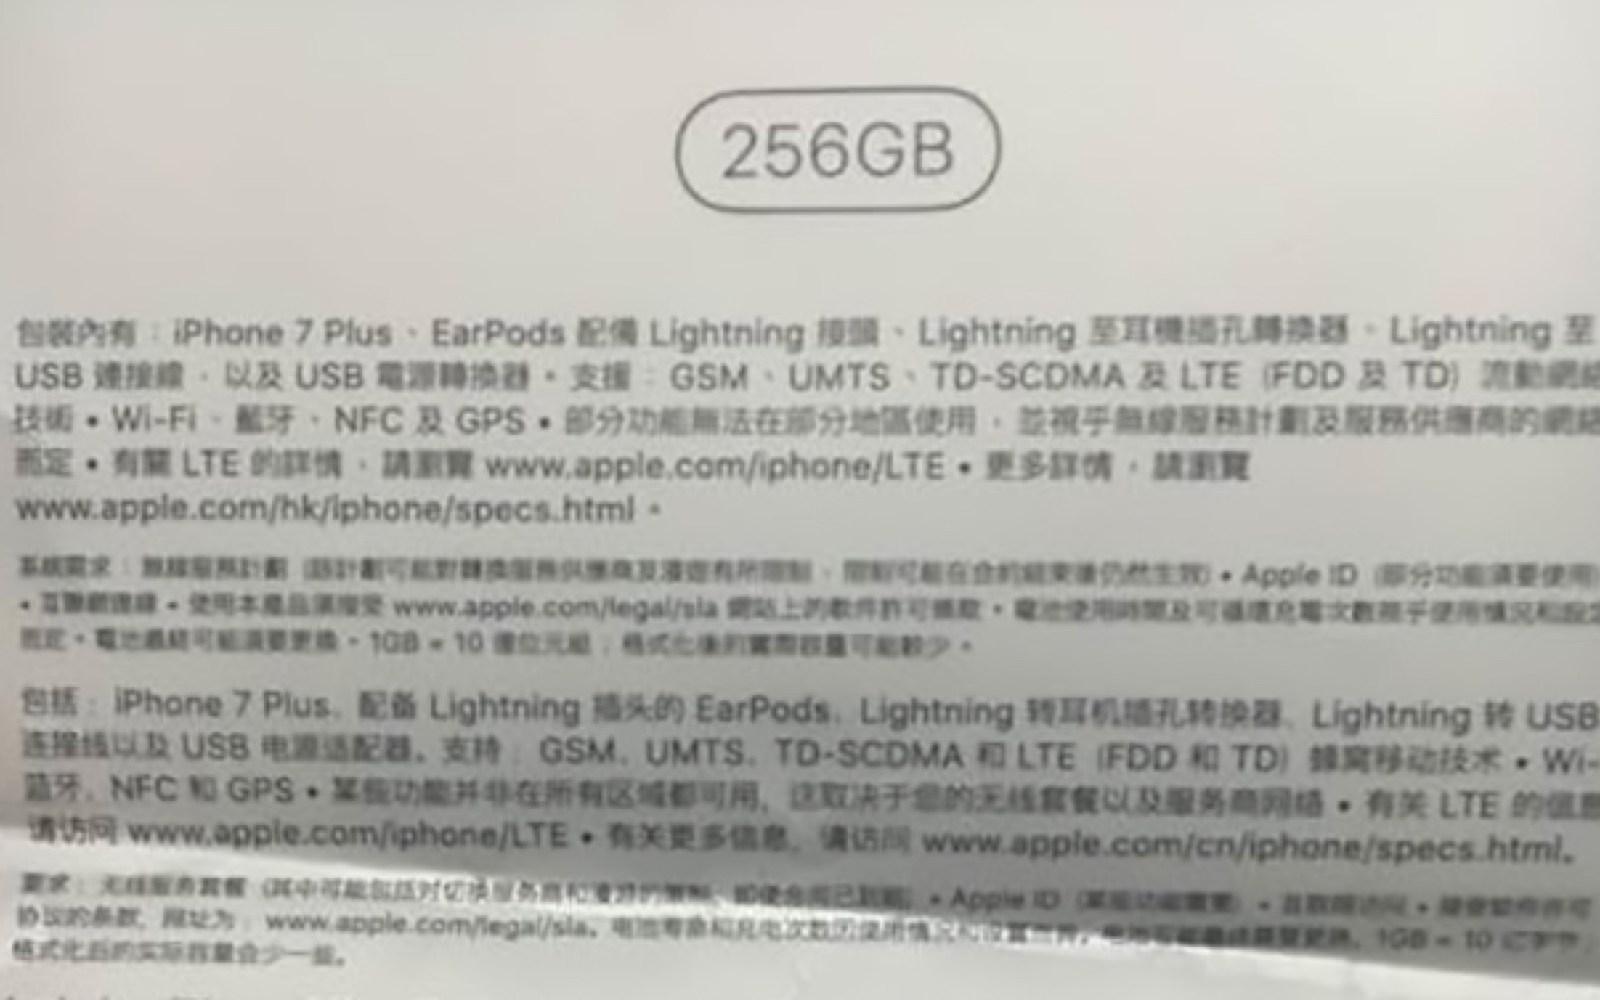 Leaked 'iPhone 7 Plus' packaging indicates Lightning EarPods and Lightning 3.5mm headphone jack adaptor bundled in the box